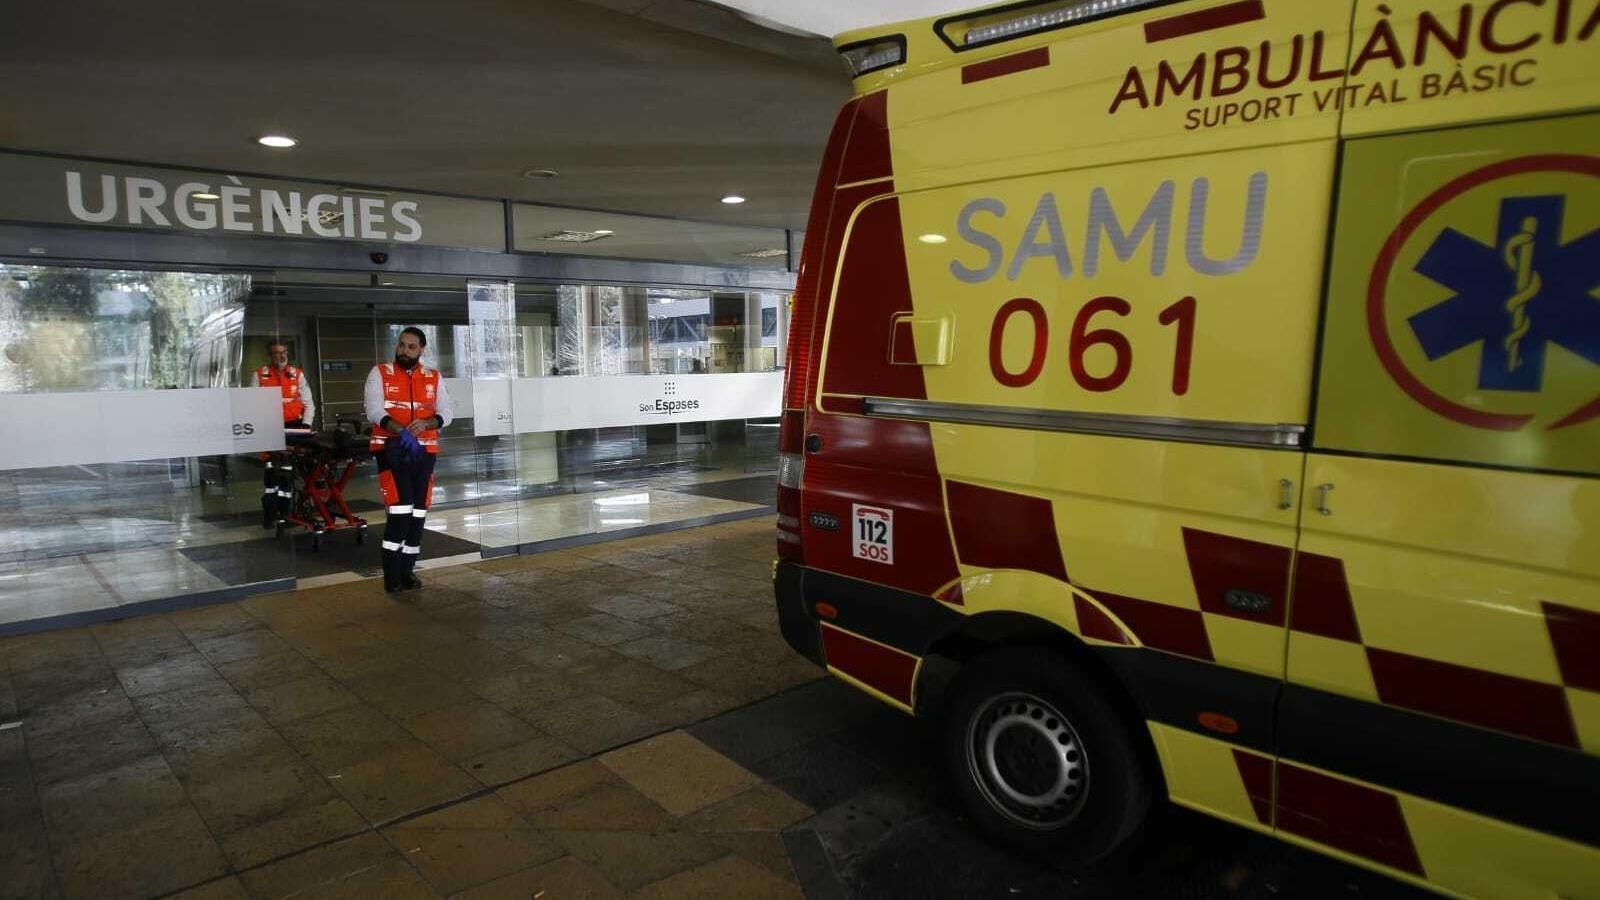 Tercera persona morta a Mallorca amb coronavirus